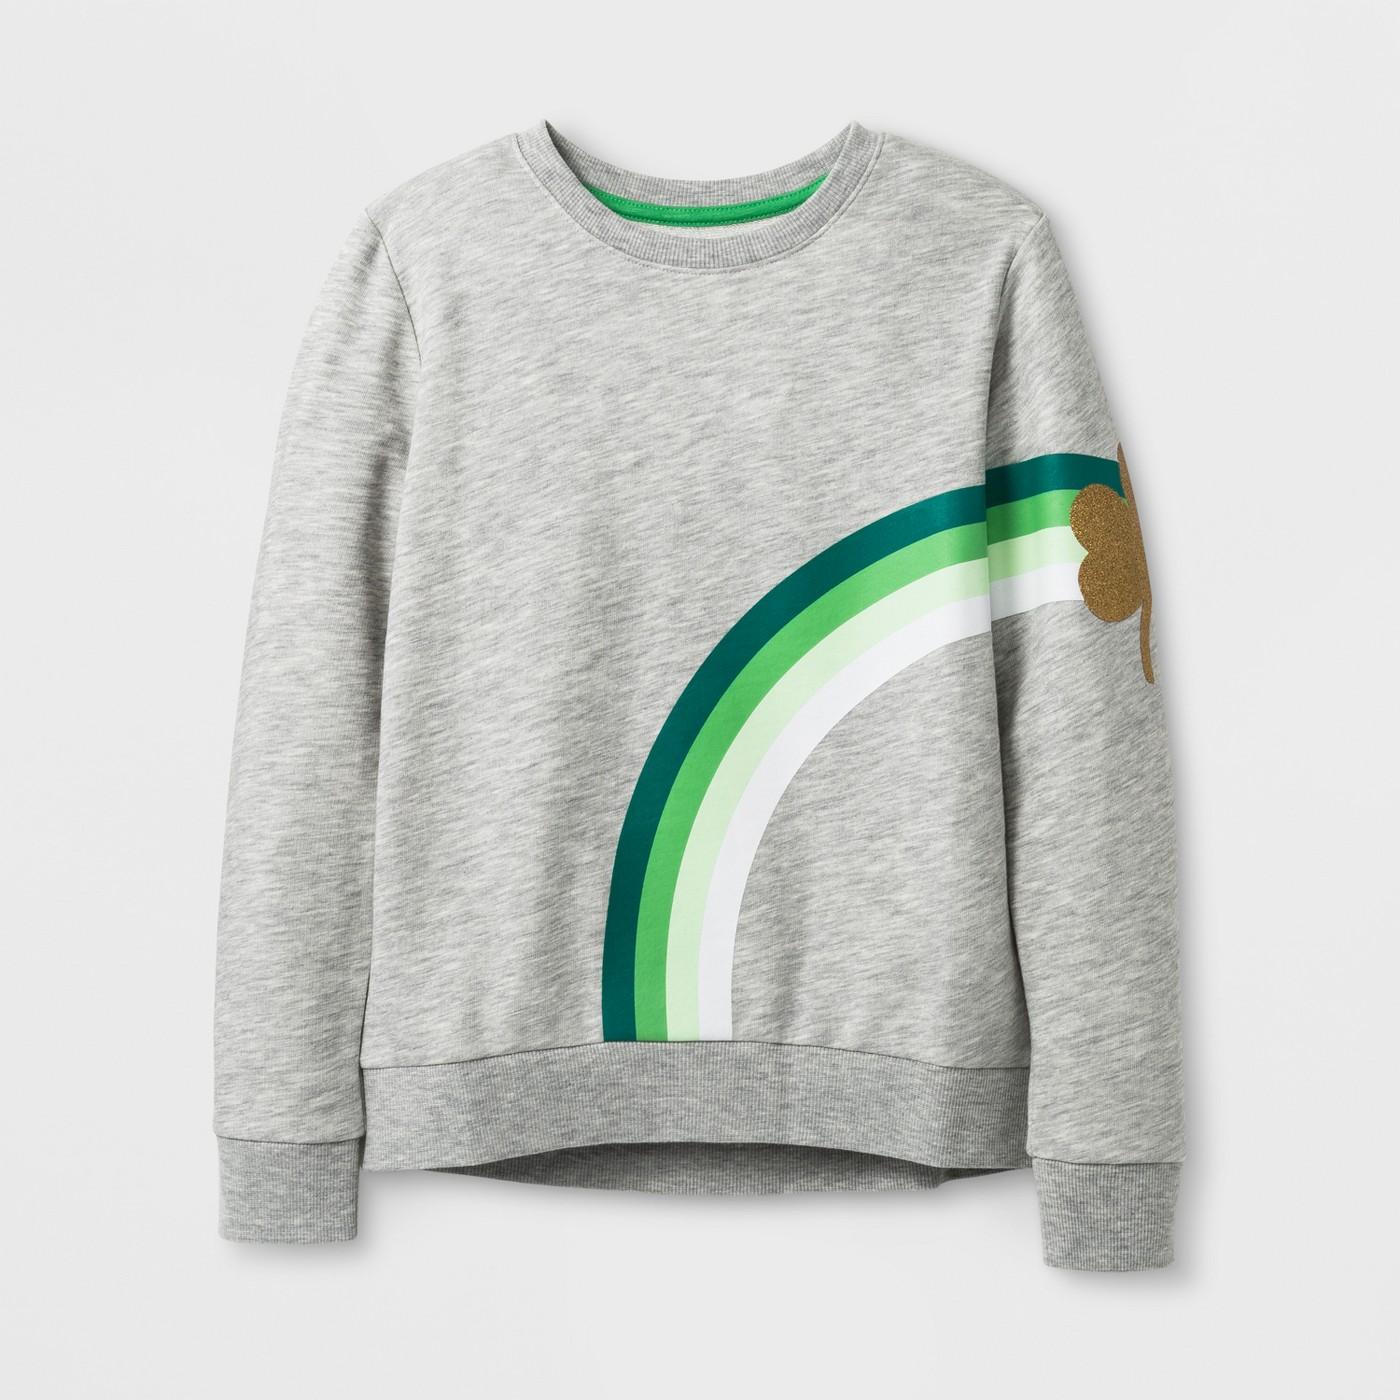 Girls St. Patrick's Day Sweatshirt $12.99-.jpeg